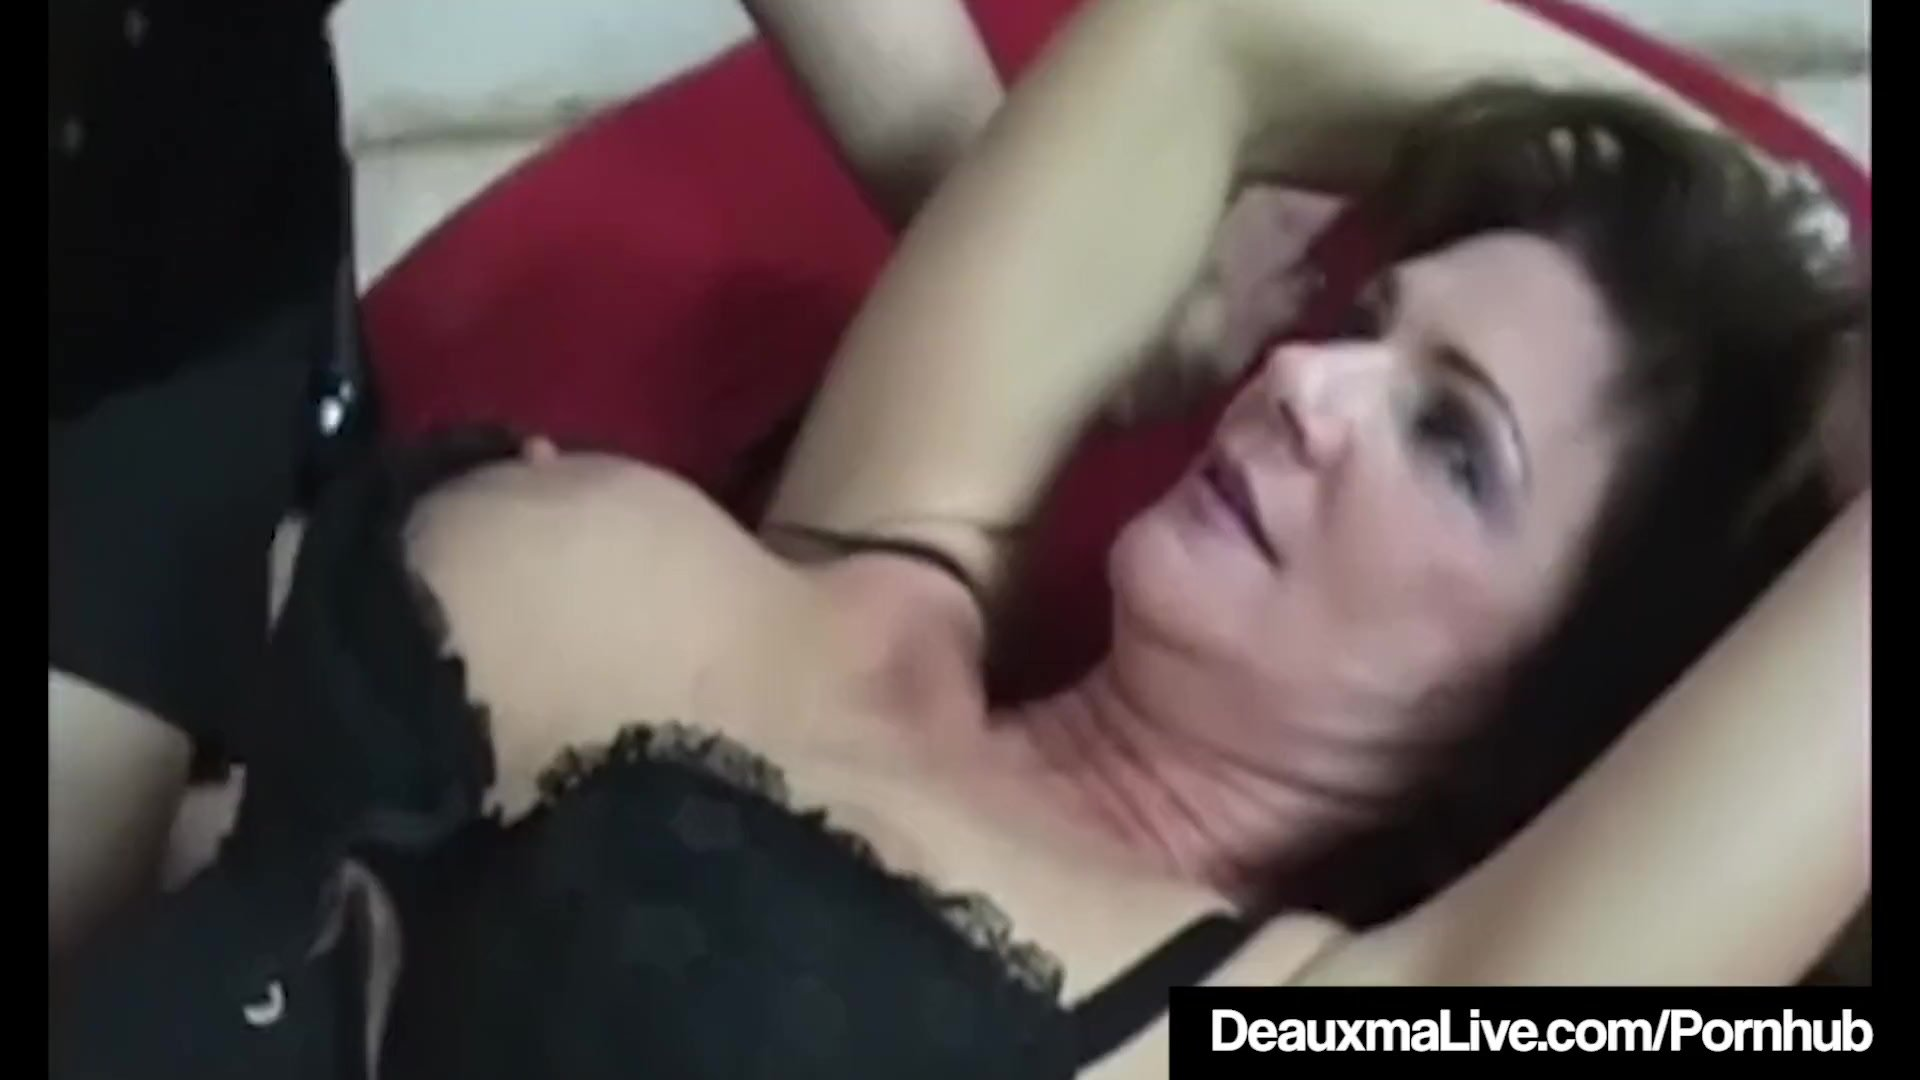 Angie Noir Actriz Porno cougar deauxma tied up & dominatedmistress sarah blake!